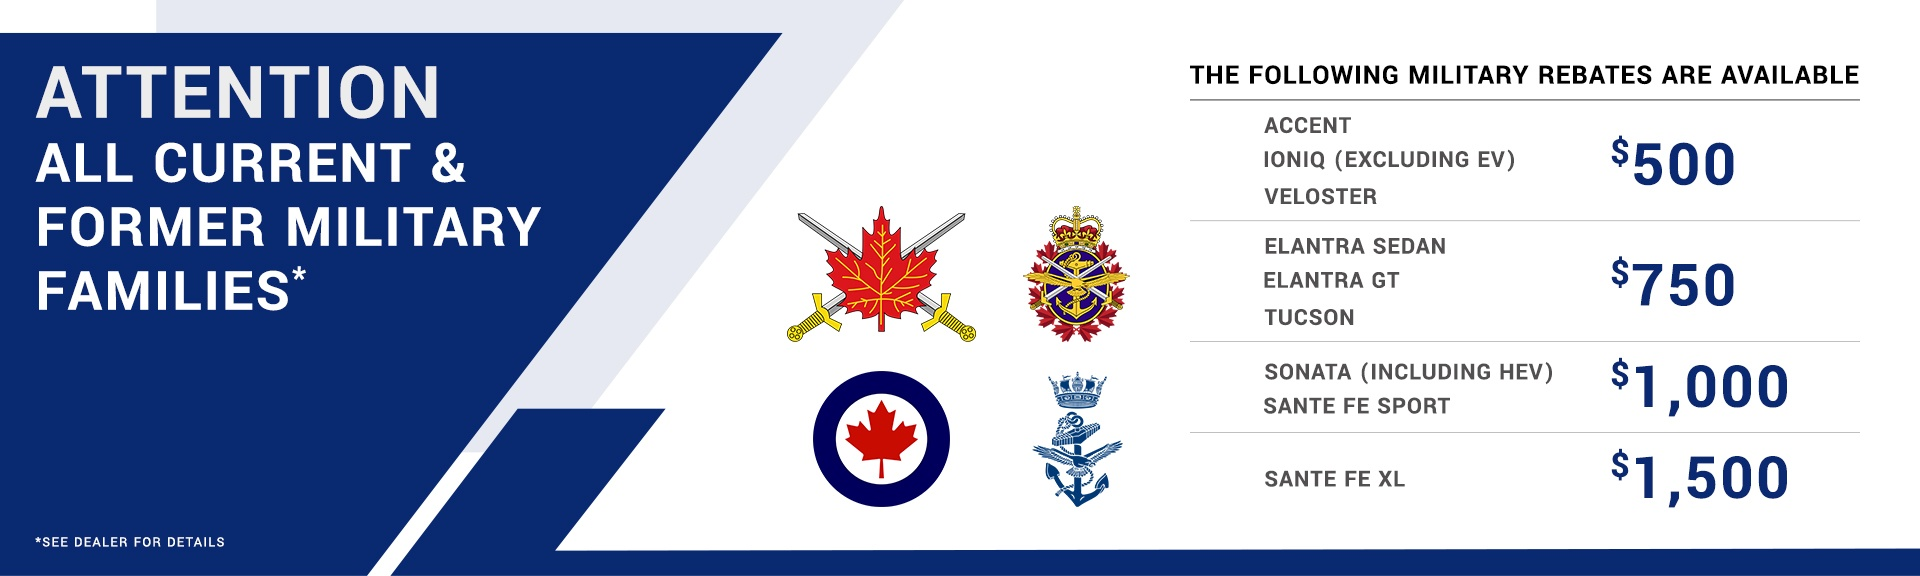 Military Rebates Kitchener Hyundai